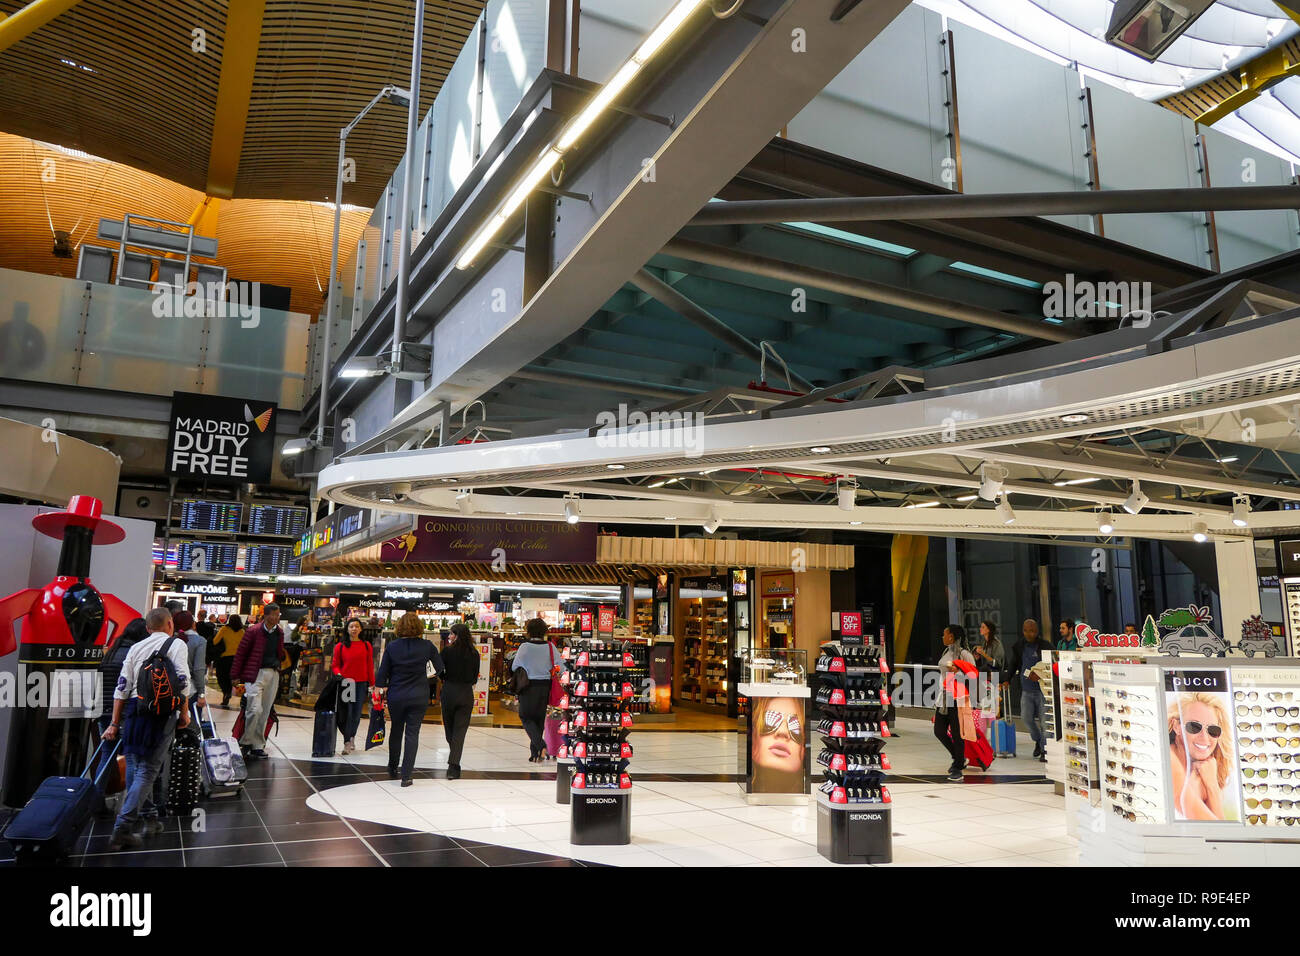 International Airport Adolfo Suárez Madrid-Barajas, Madrid, Spain - Stock Image